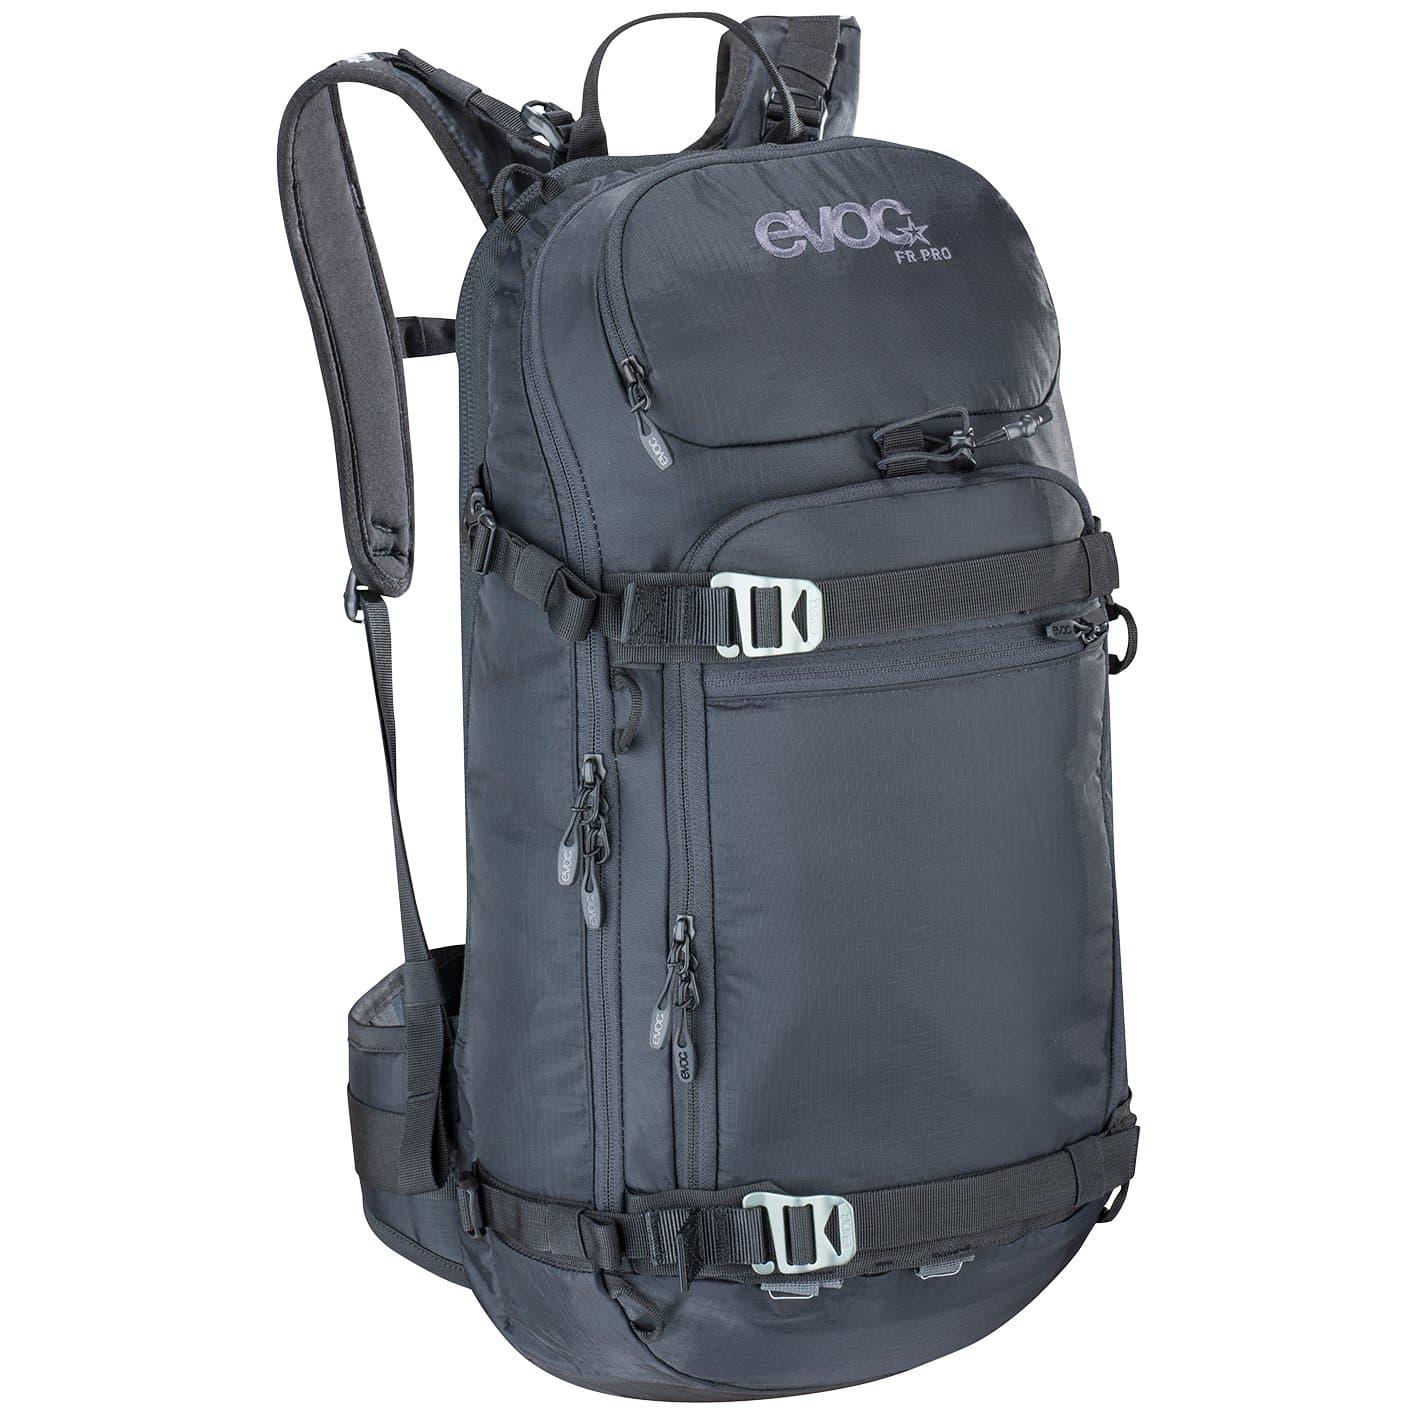 Evoc FR Pro Backpack Protecteurs de sac à dos